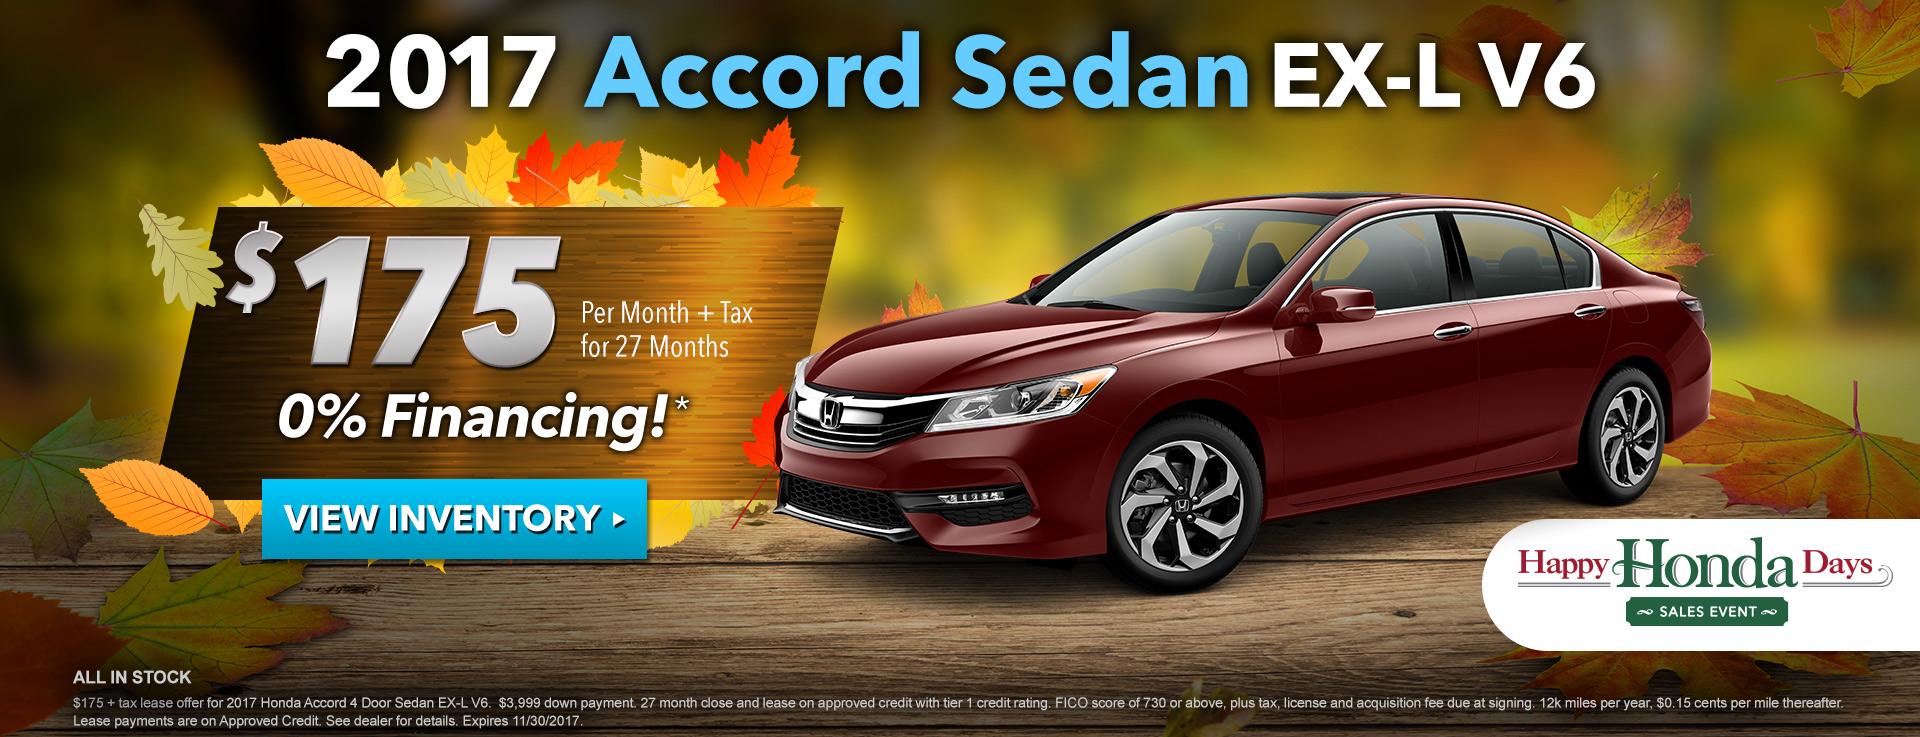 Accord EX-L V6